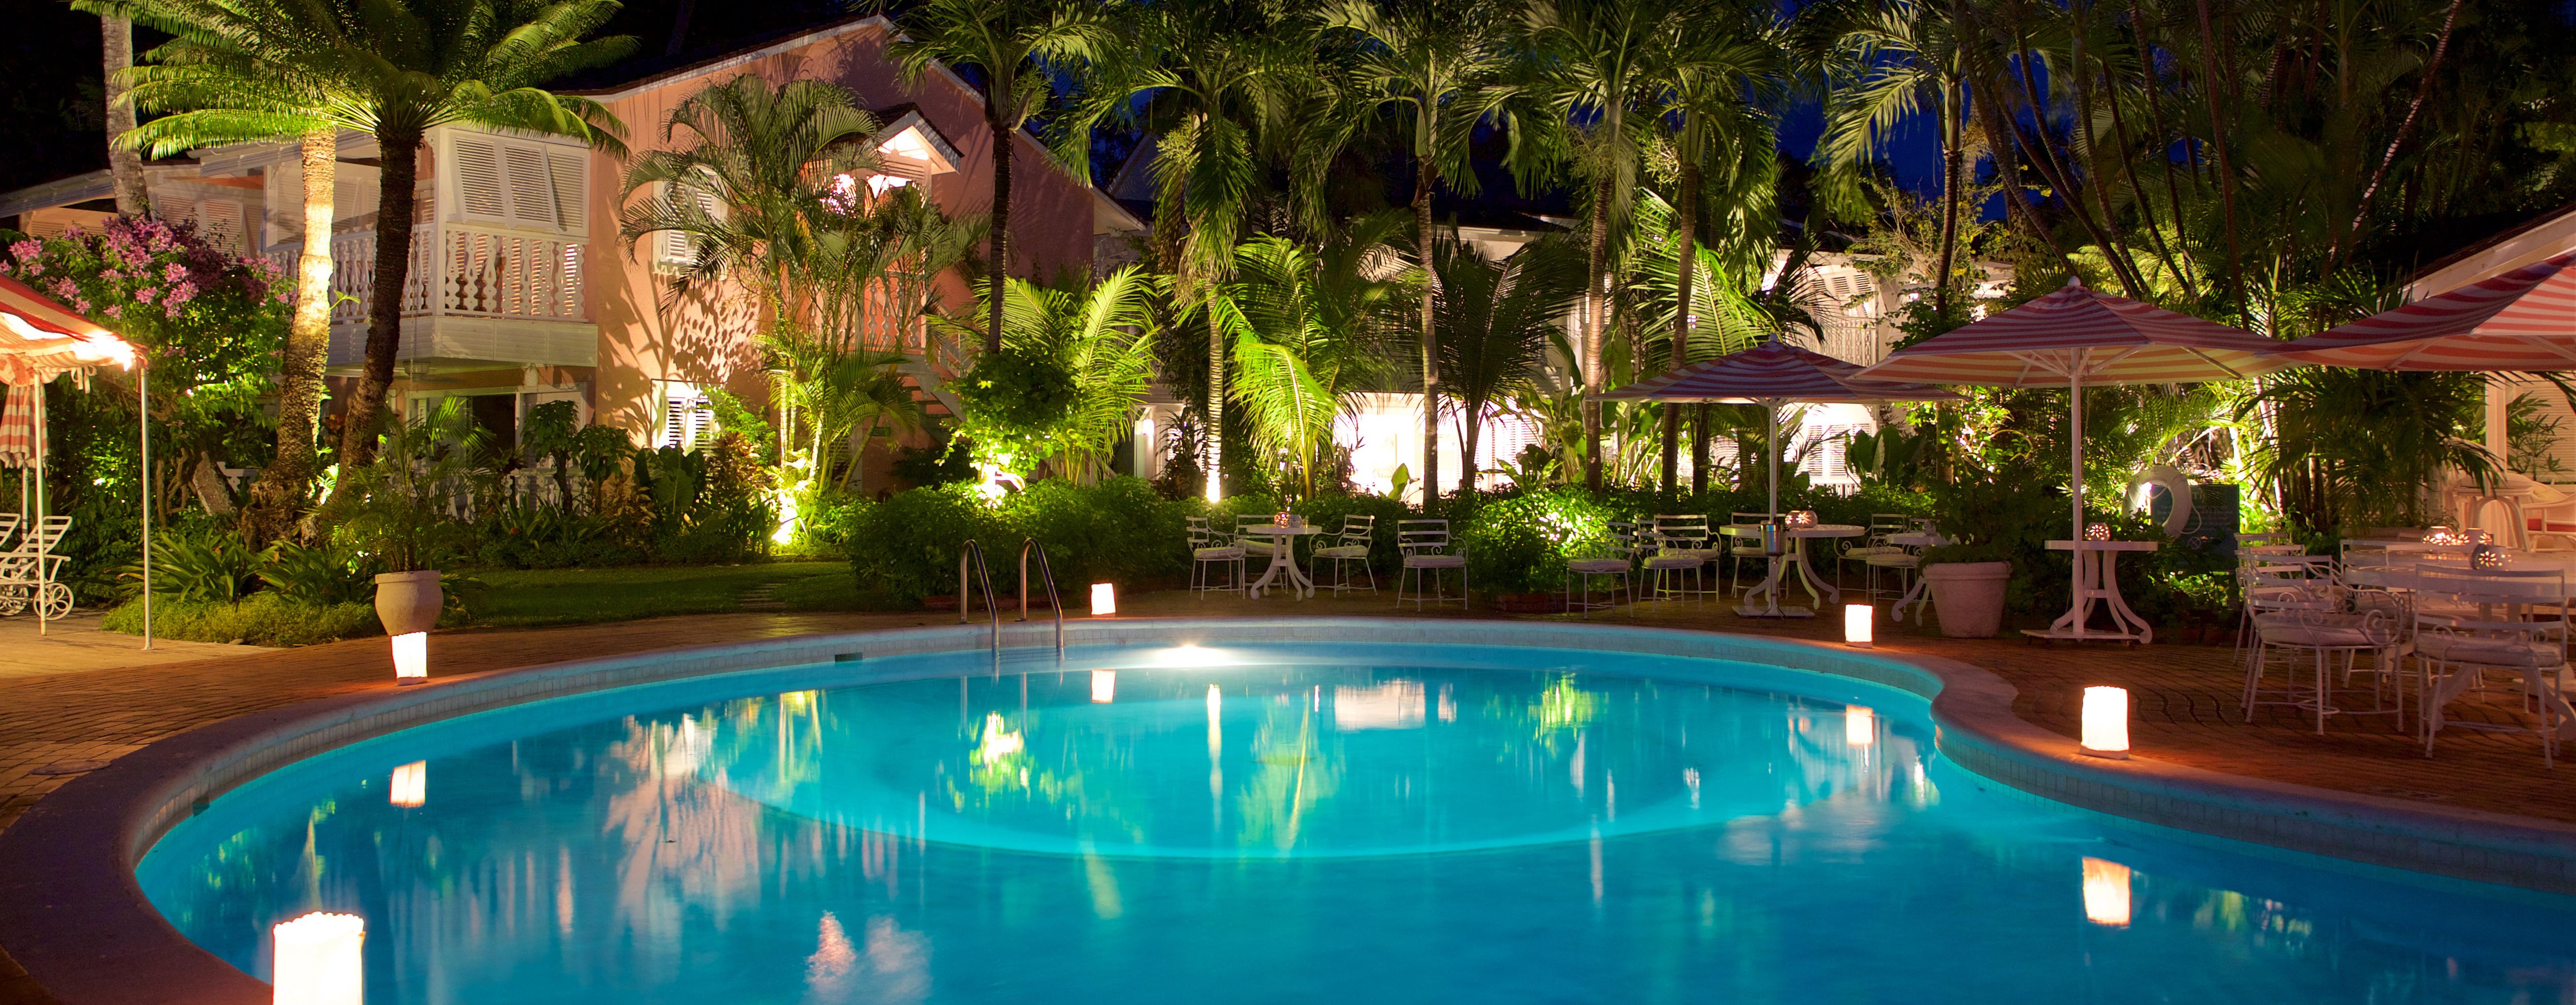 cobblers-cove-pool-night